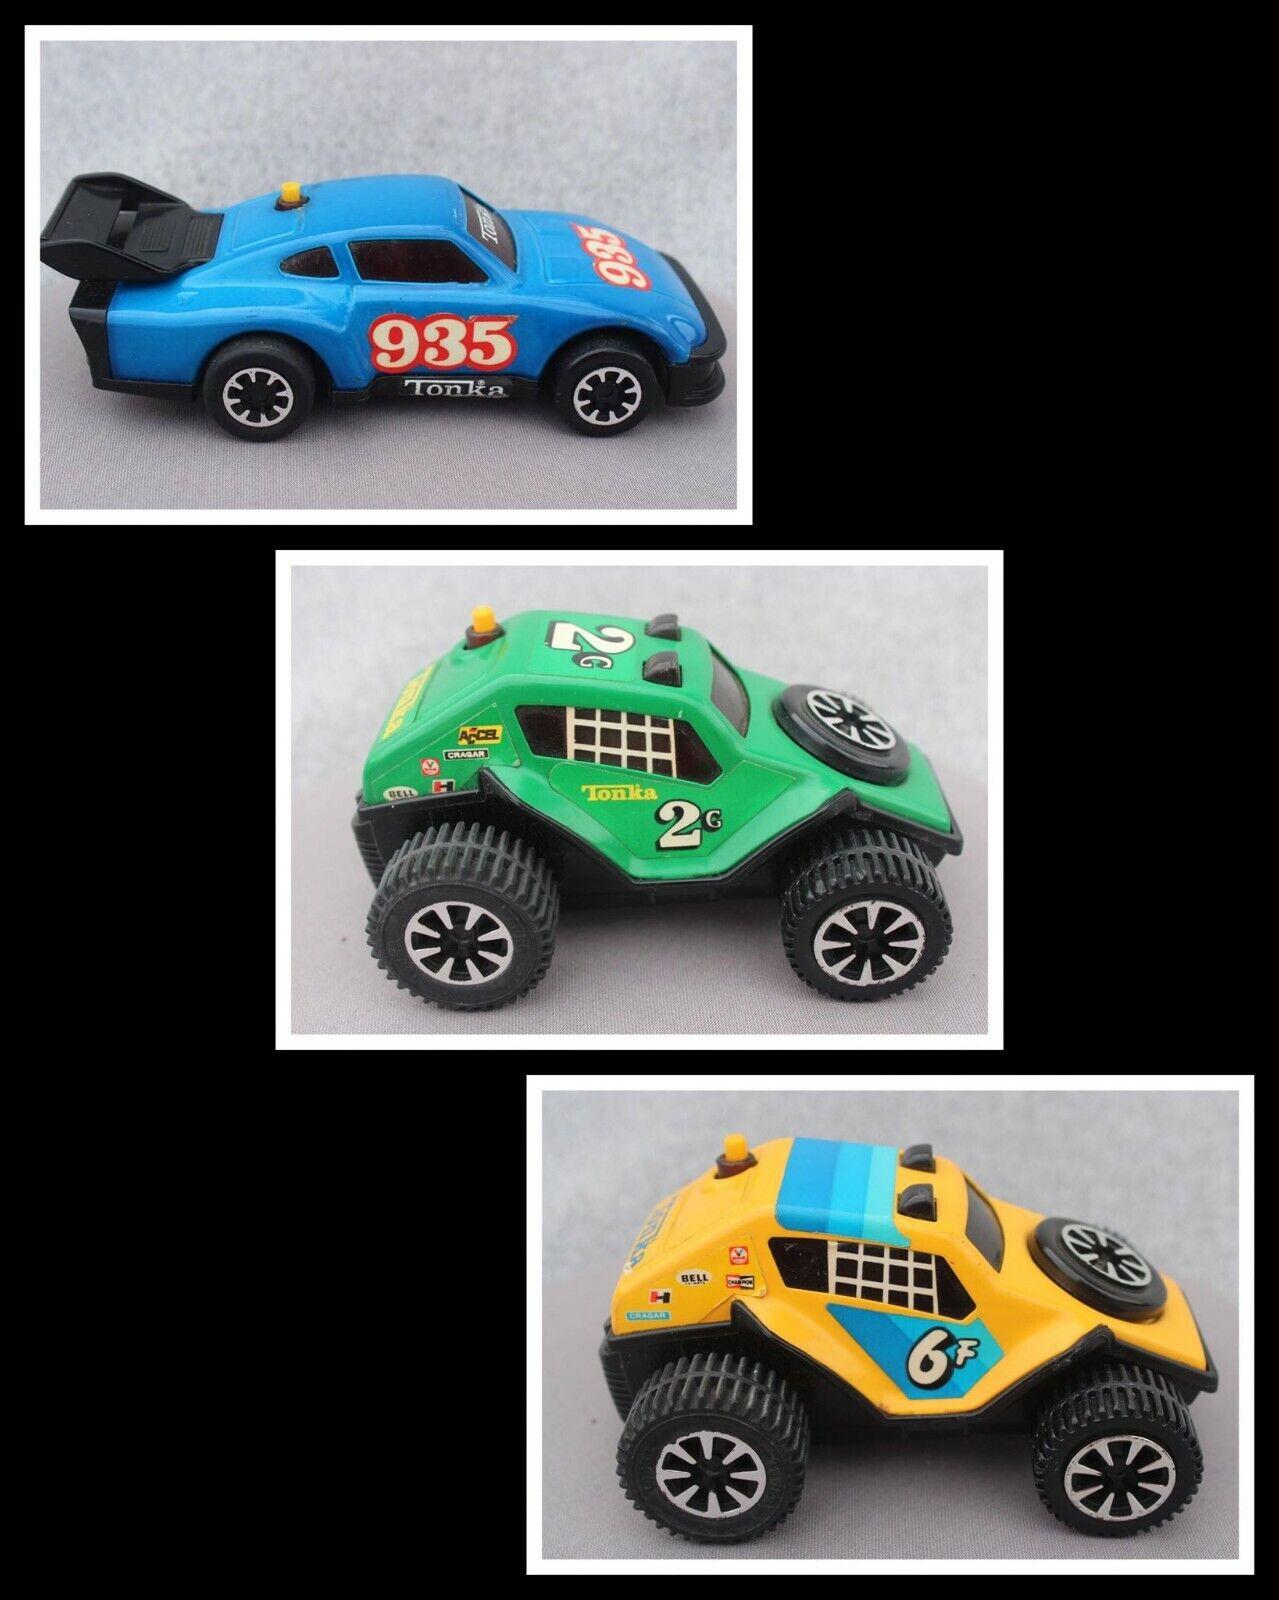 3 TONKA Clutch Popper Friction Car Porsche 935 116Baja 6F 187Dune Crawl 2G 126